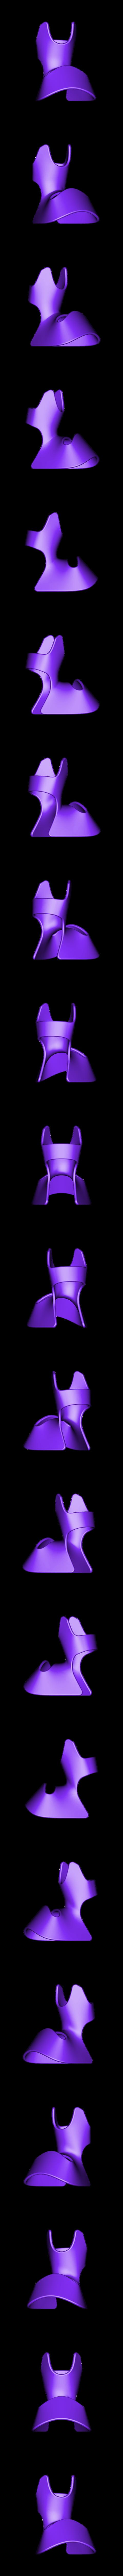 Puppy2018.stl Download free STL file Puppy dog • 3D printable design, 2LA